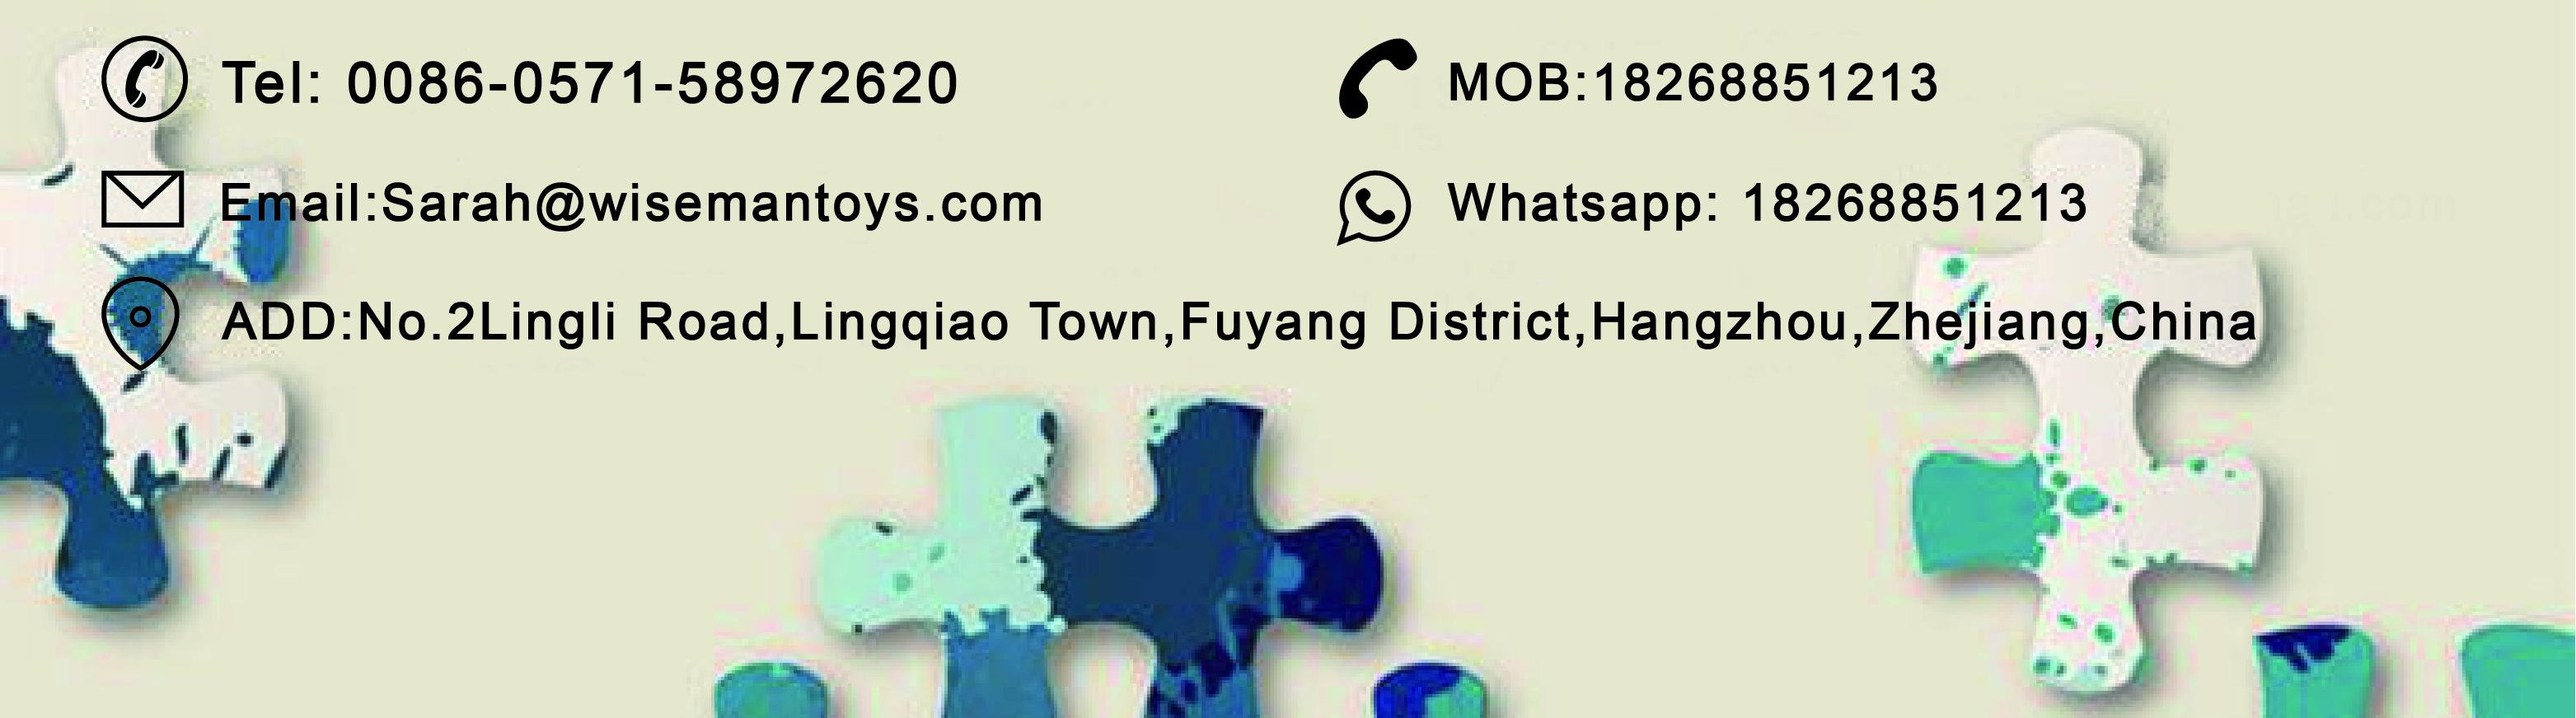 contact inform